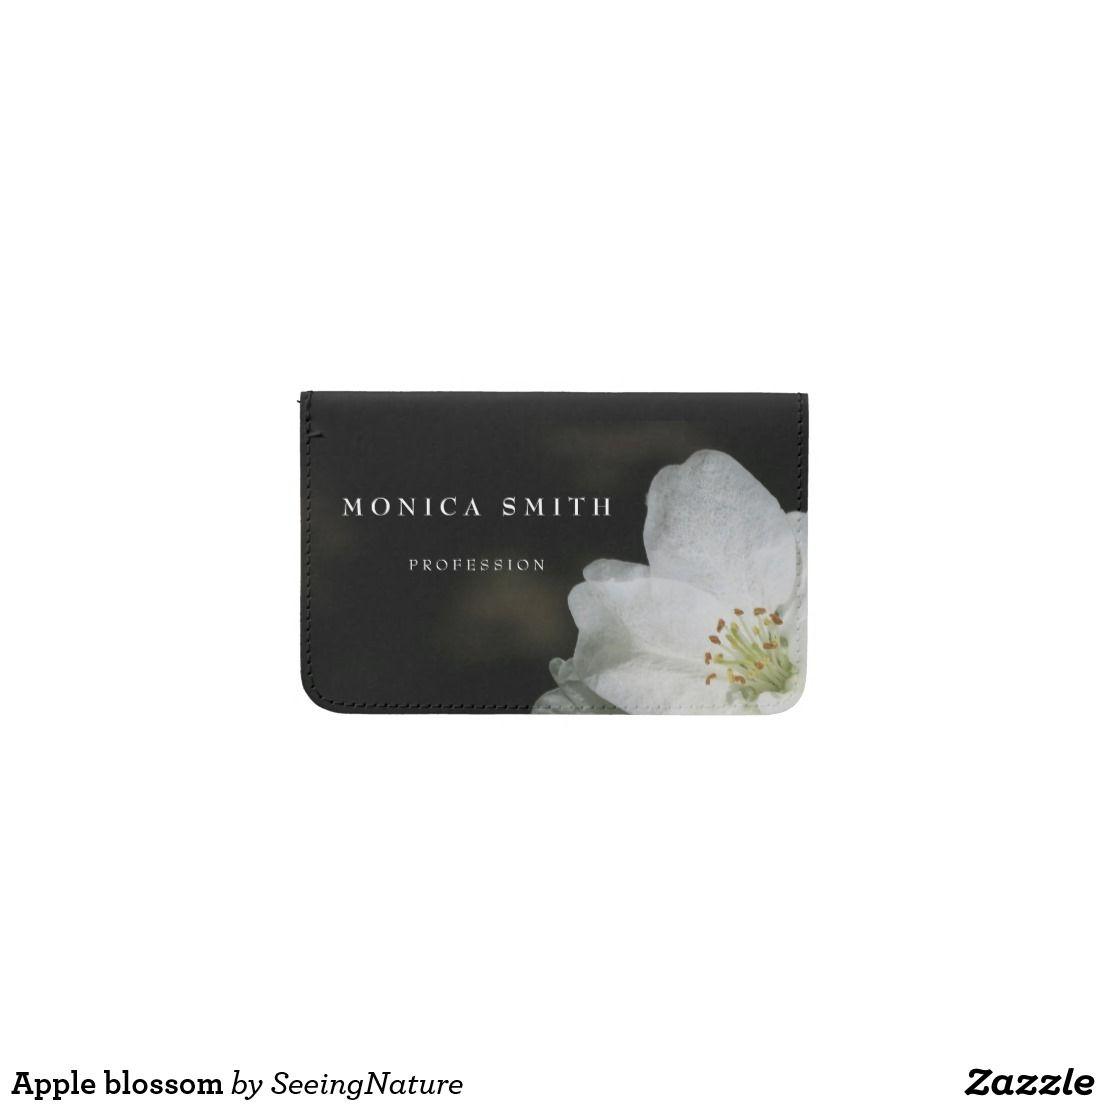 Apple blossom business card holder | Business card holders